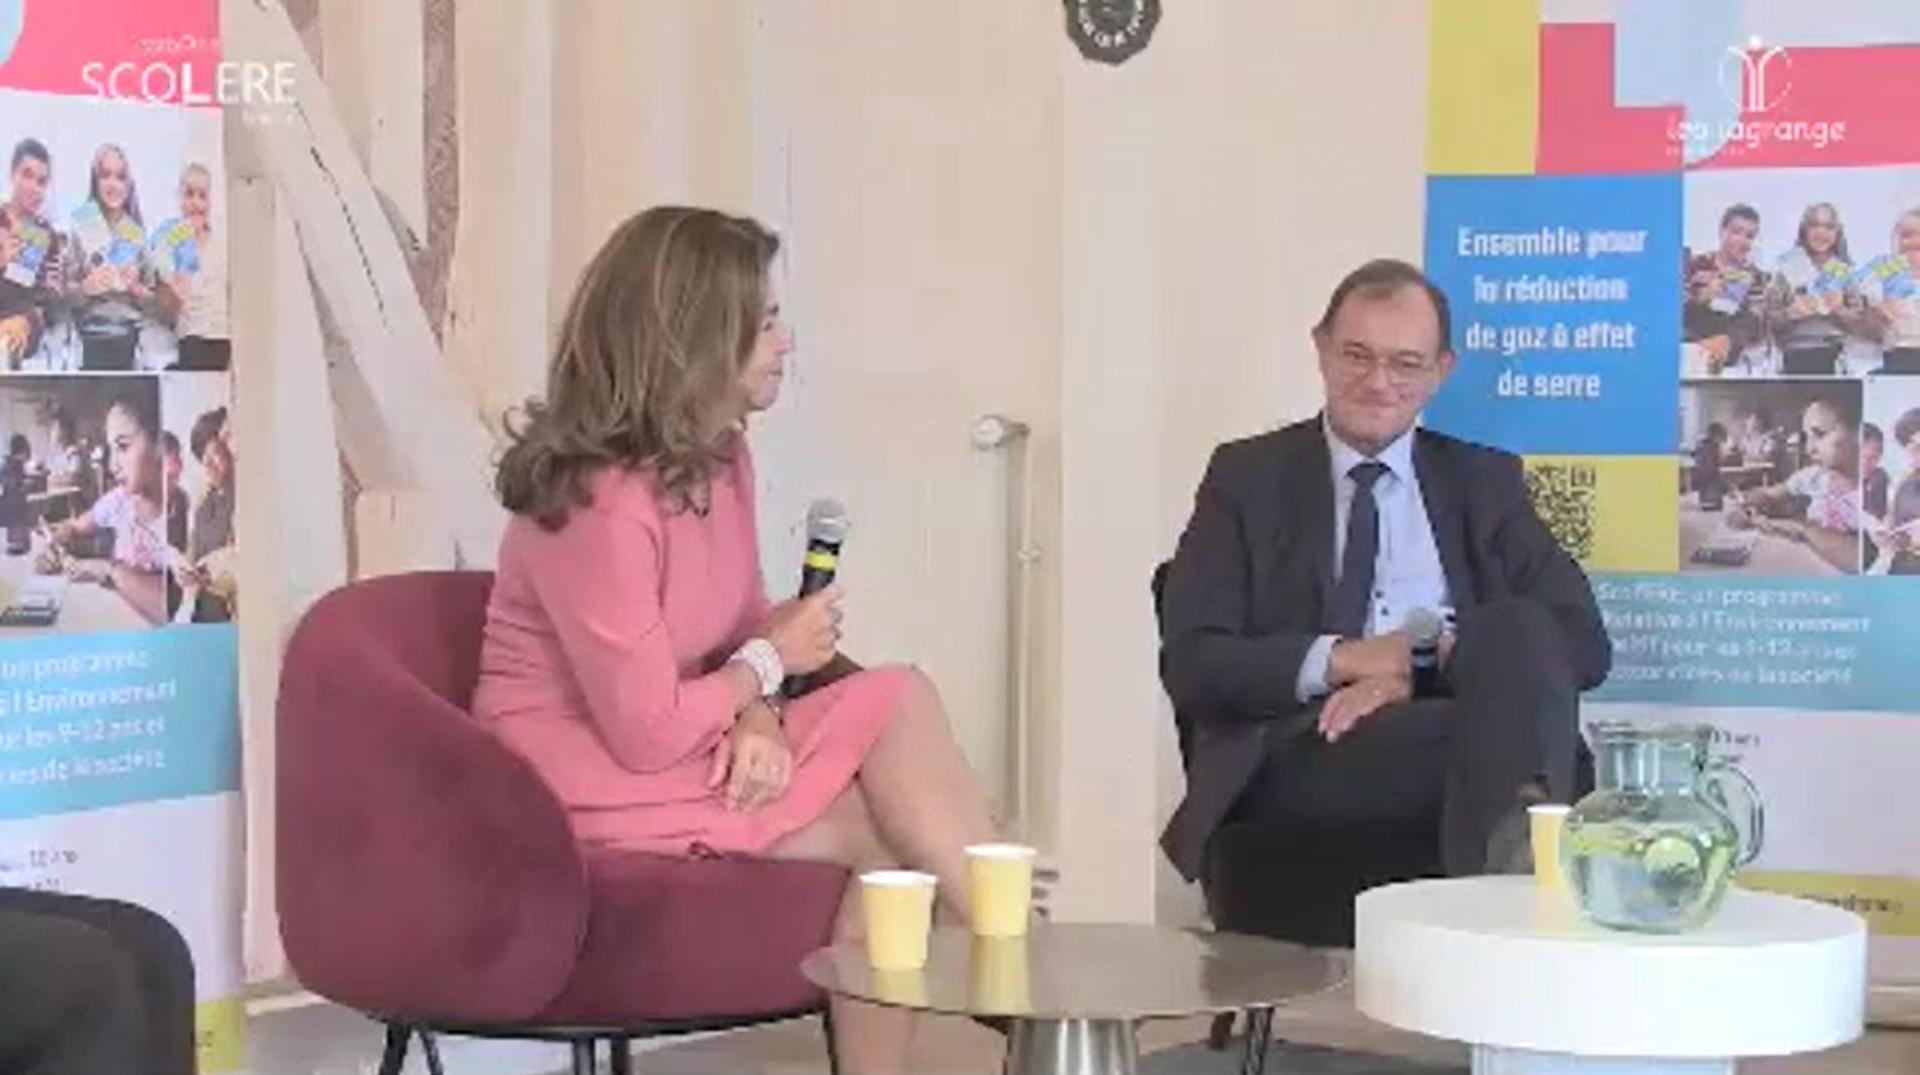 Conférence de presse Carbone Scol'ERE France1